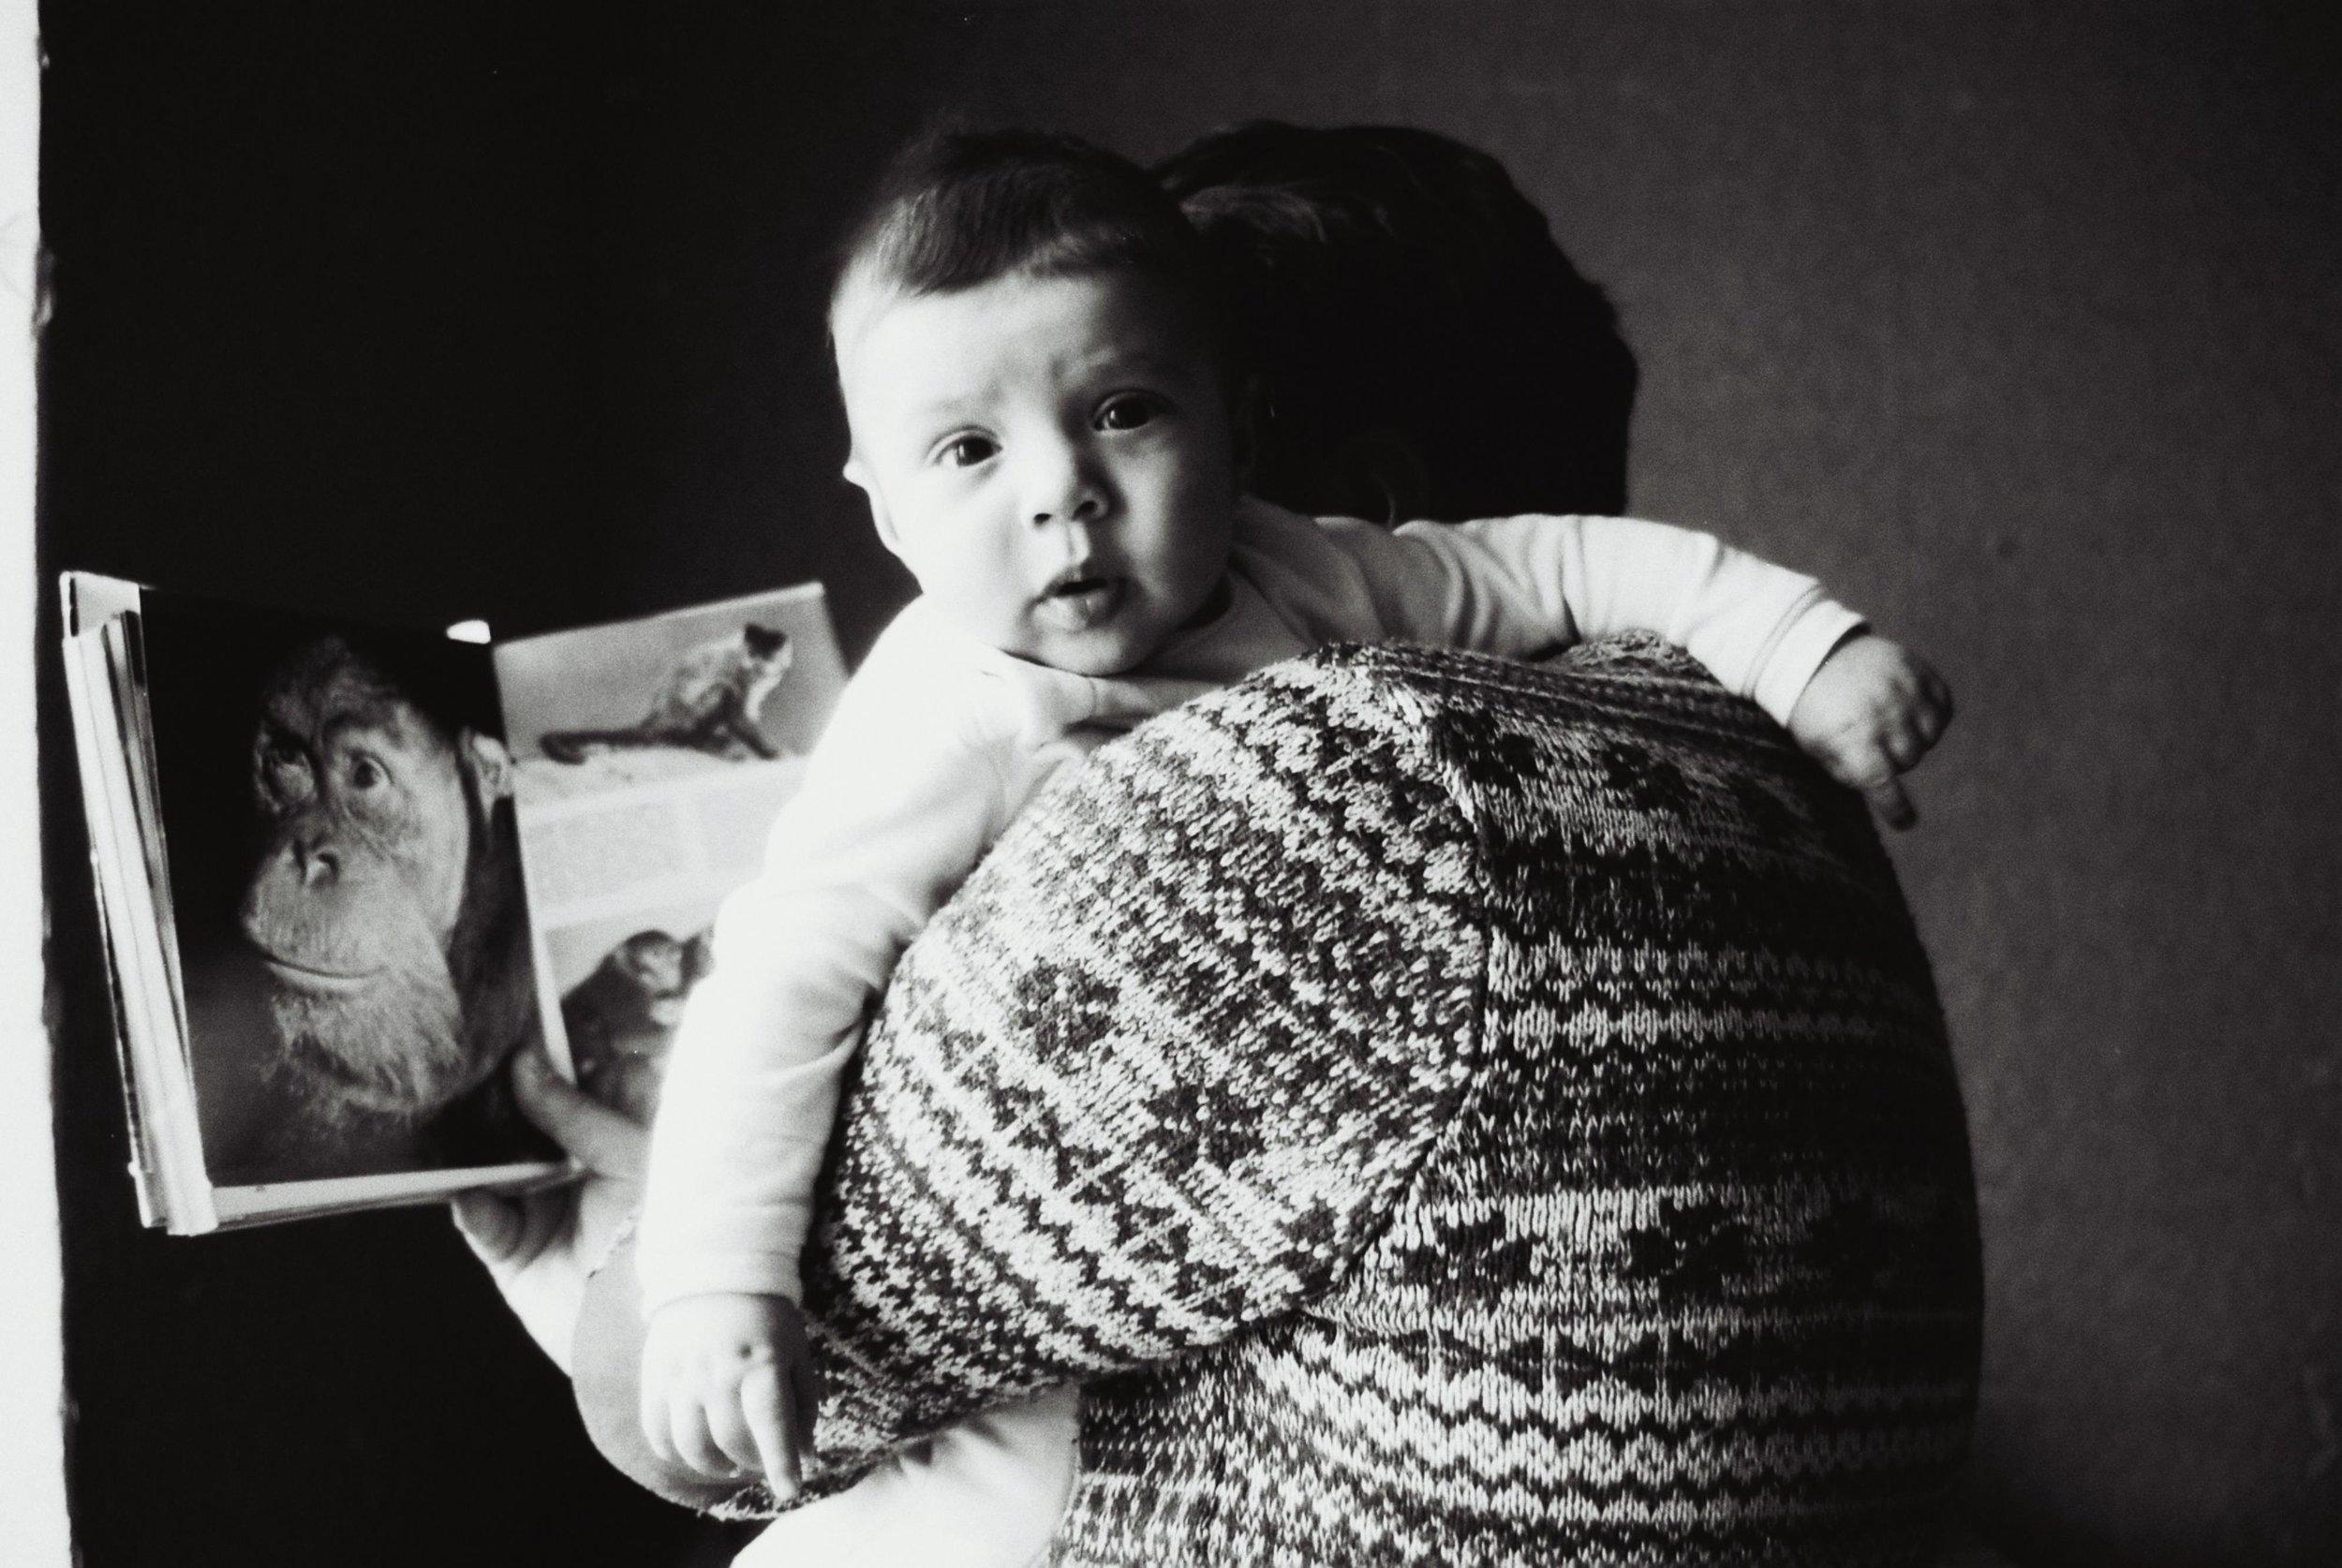 My Son | Nikon F90 | Kodak T-max 100 | Ana Dzagania